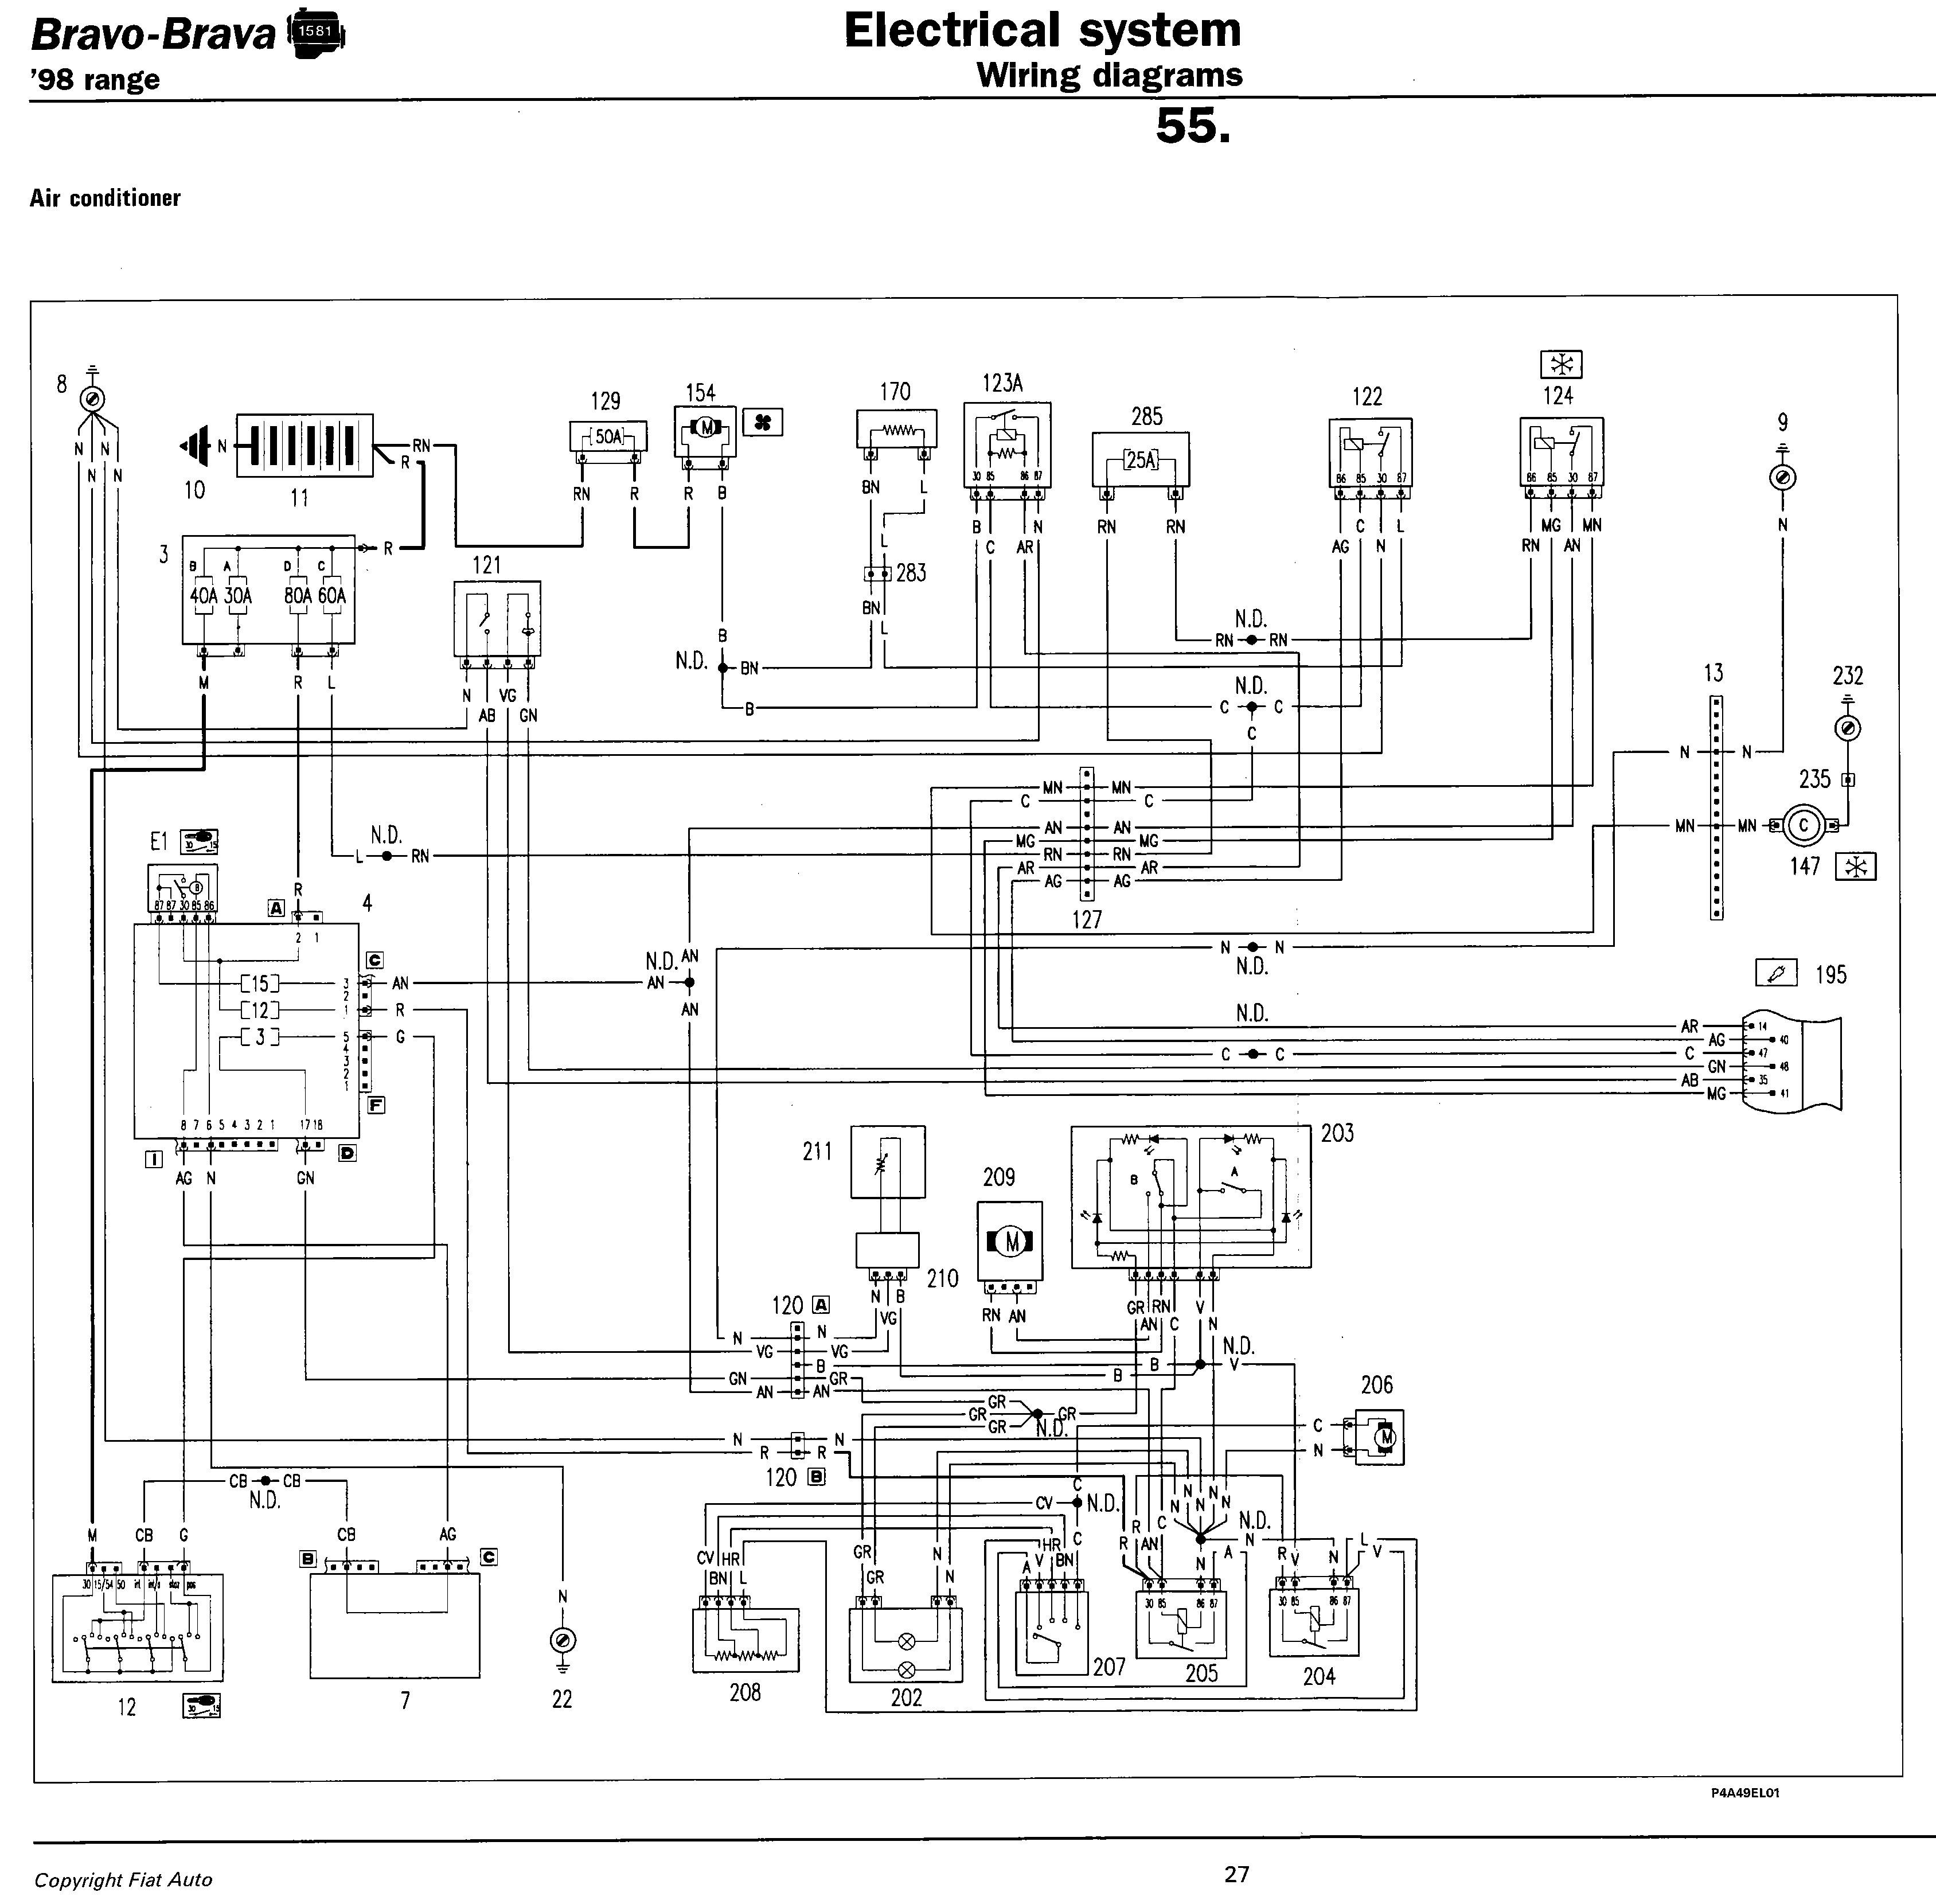 fiat 500 electrical wiring diagram wiring diagramfiat 500 electrical wiring  diagram